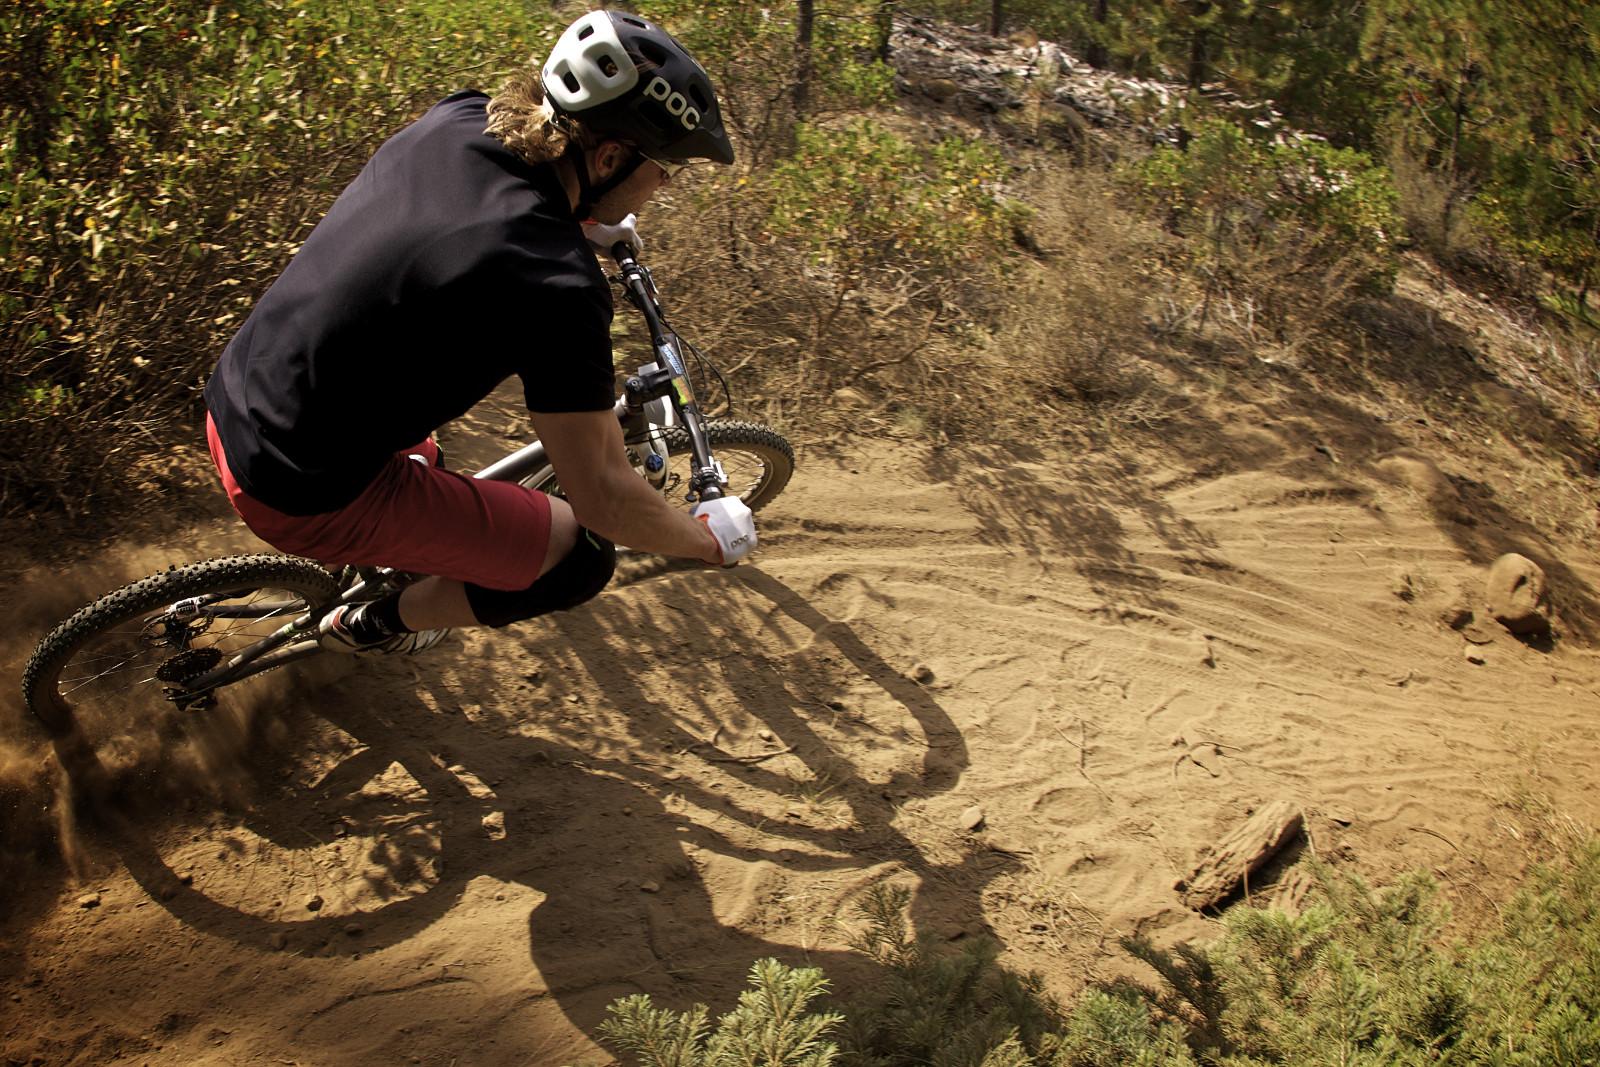 2012 Sisters Enduro Nick Gibson - corytepper.com - Mountain Biking Pictures - Vital MTB